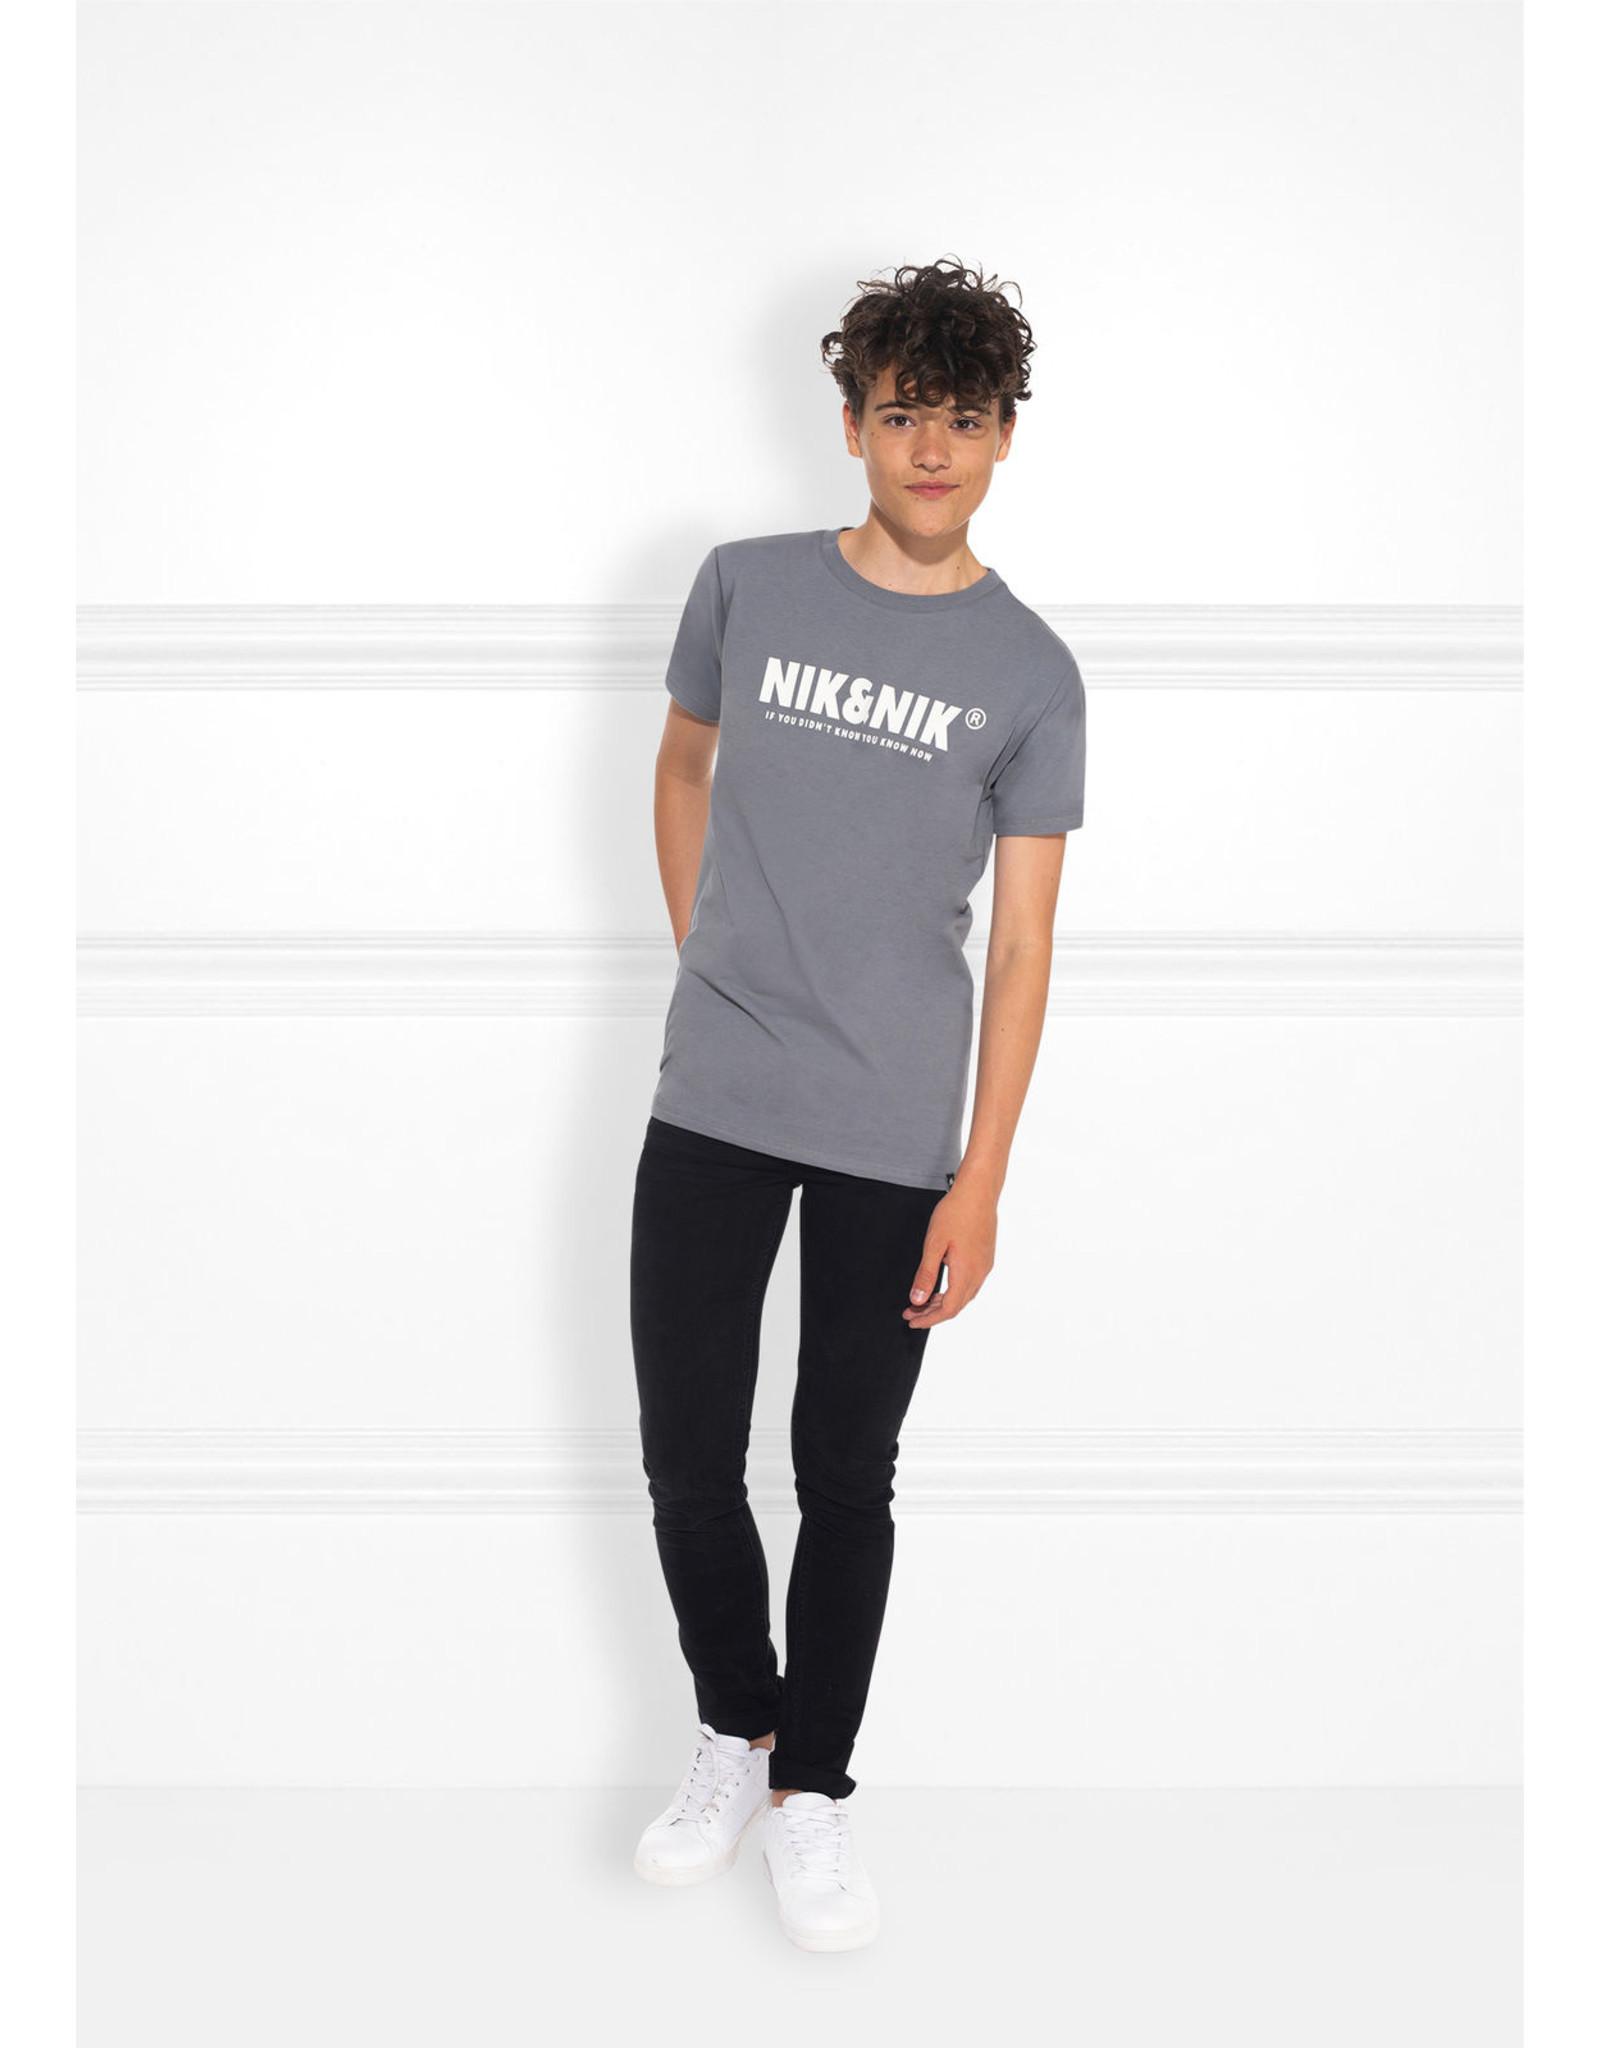 Nik&Nik NIK&NIK - You Know T-Shirt Stone Grey